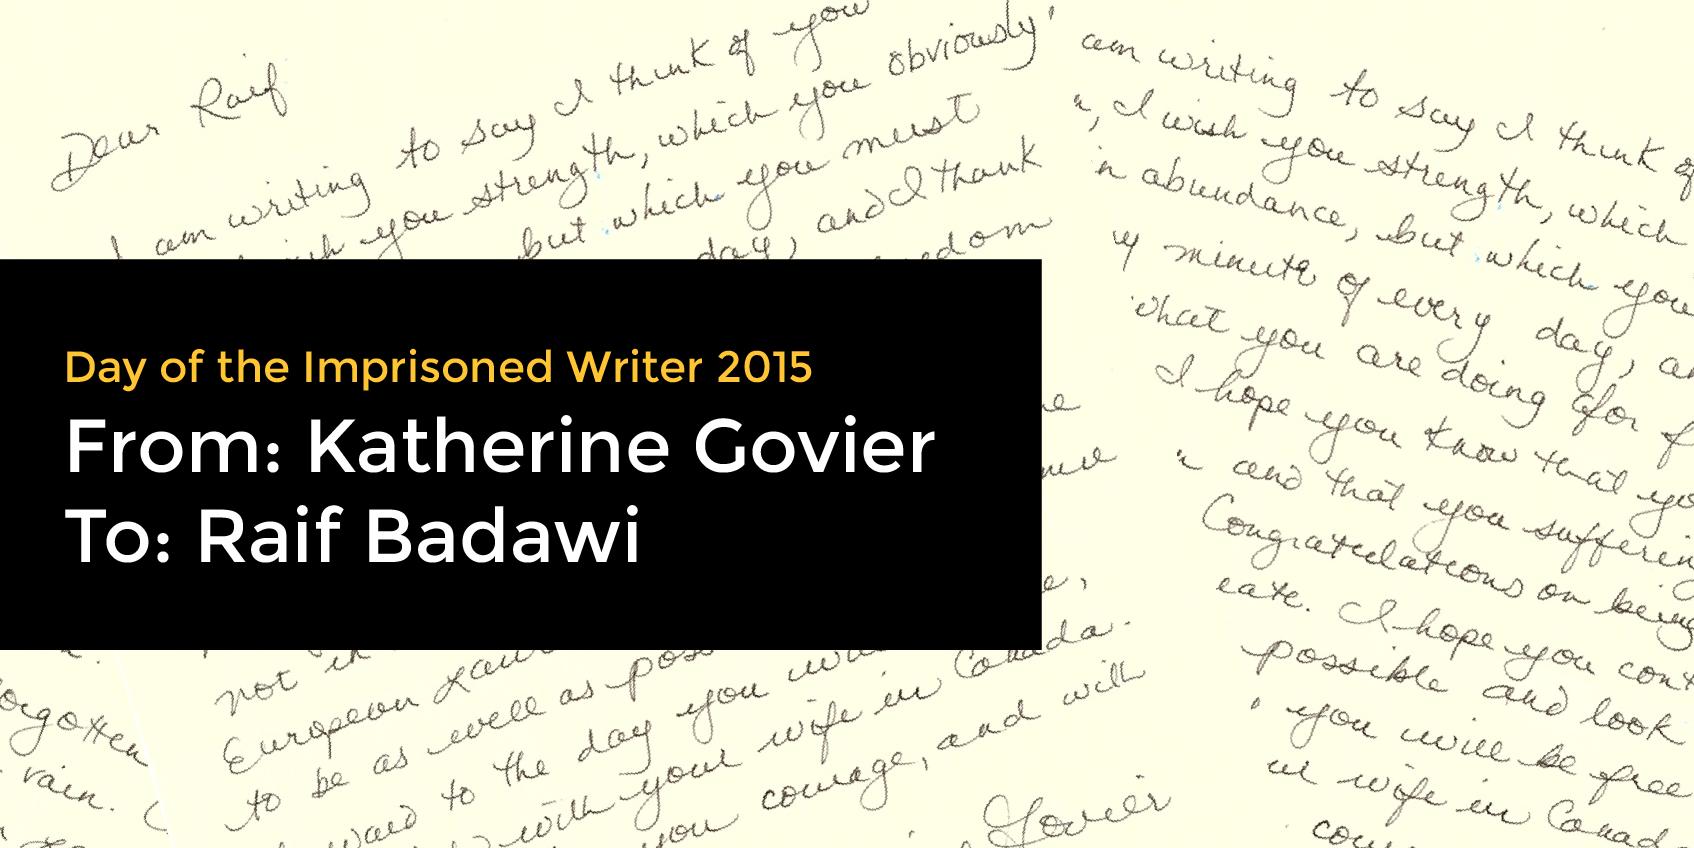 Katherine Govier writes to Raif Badawi